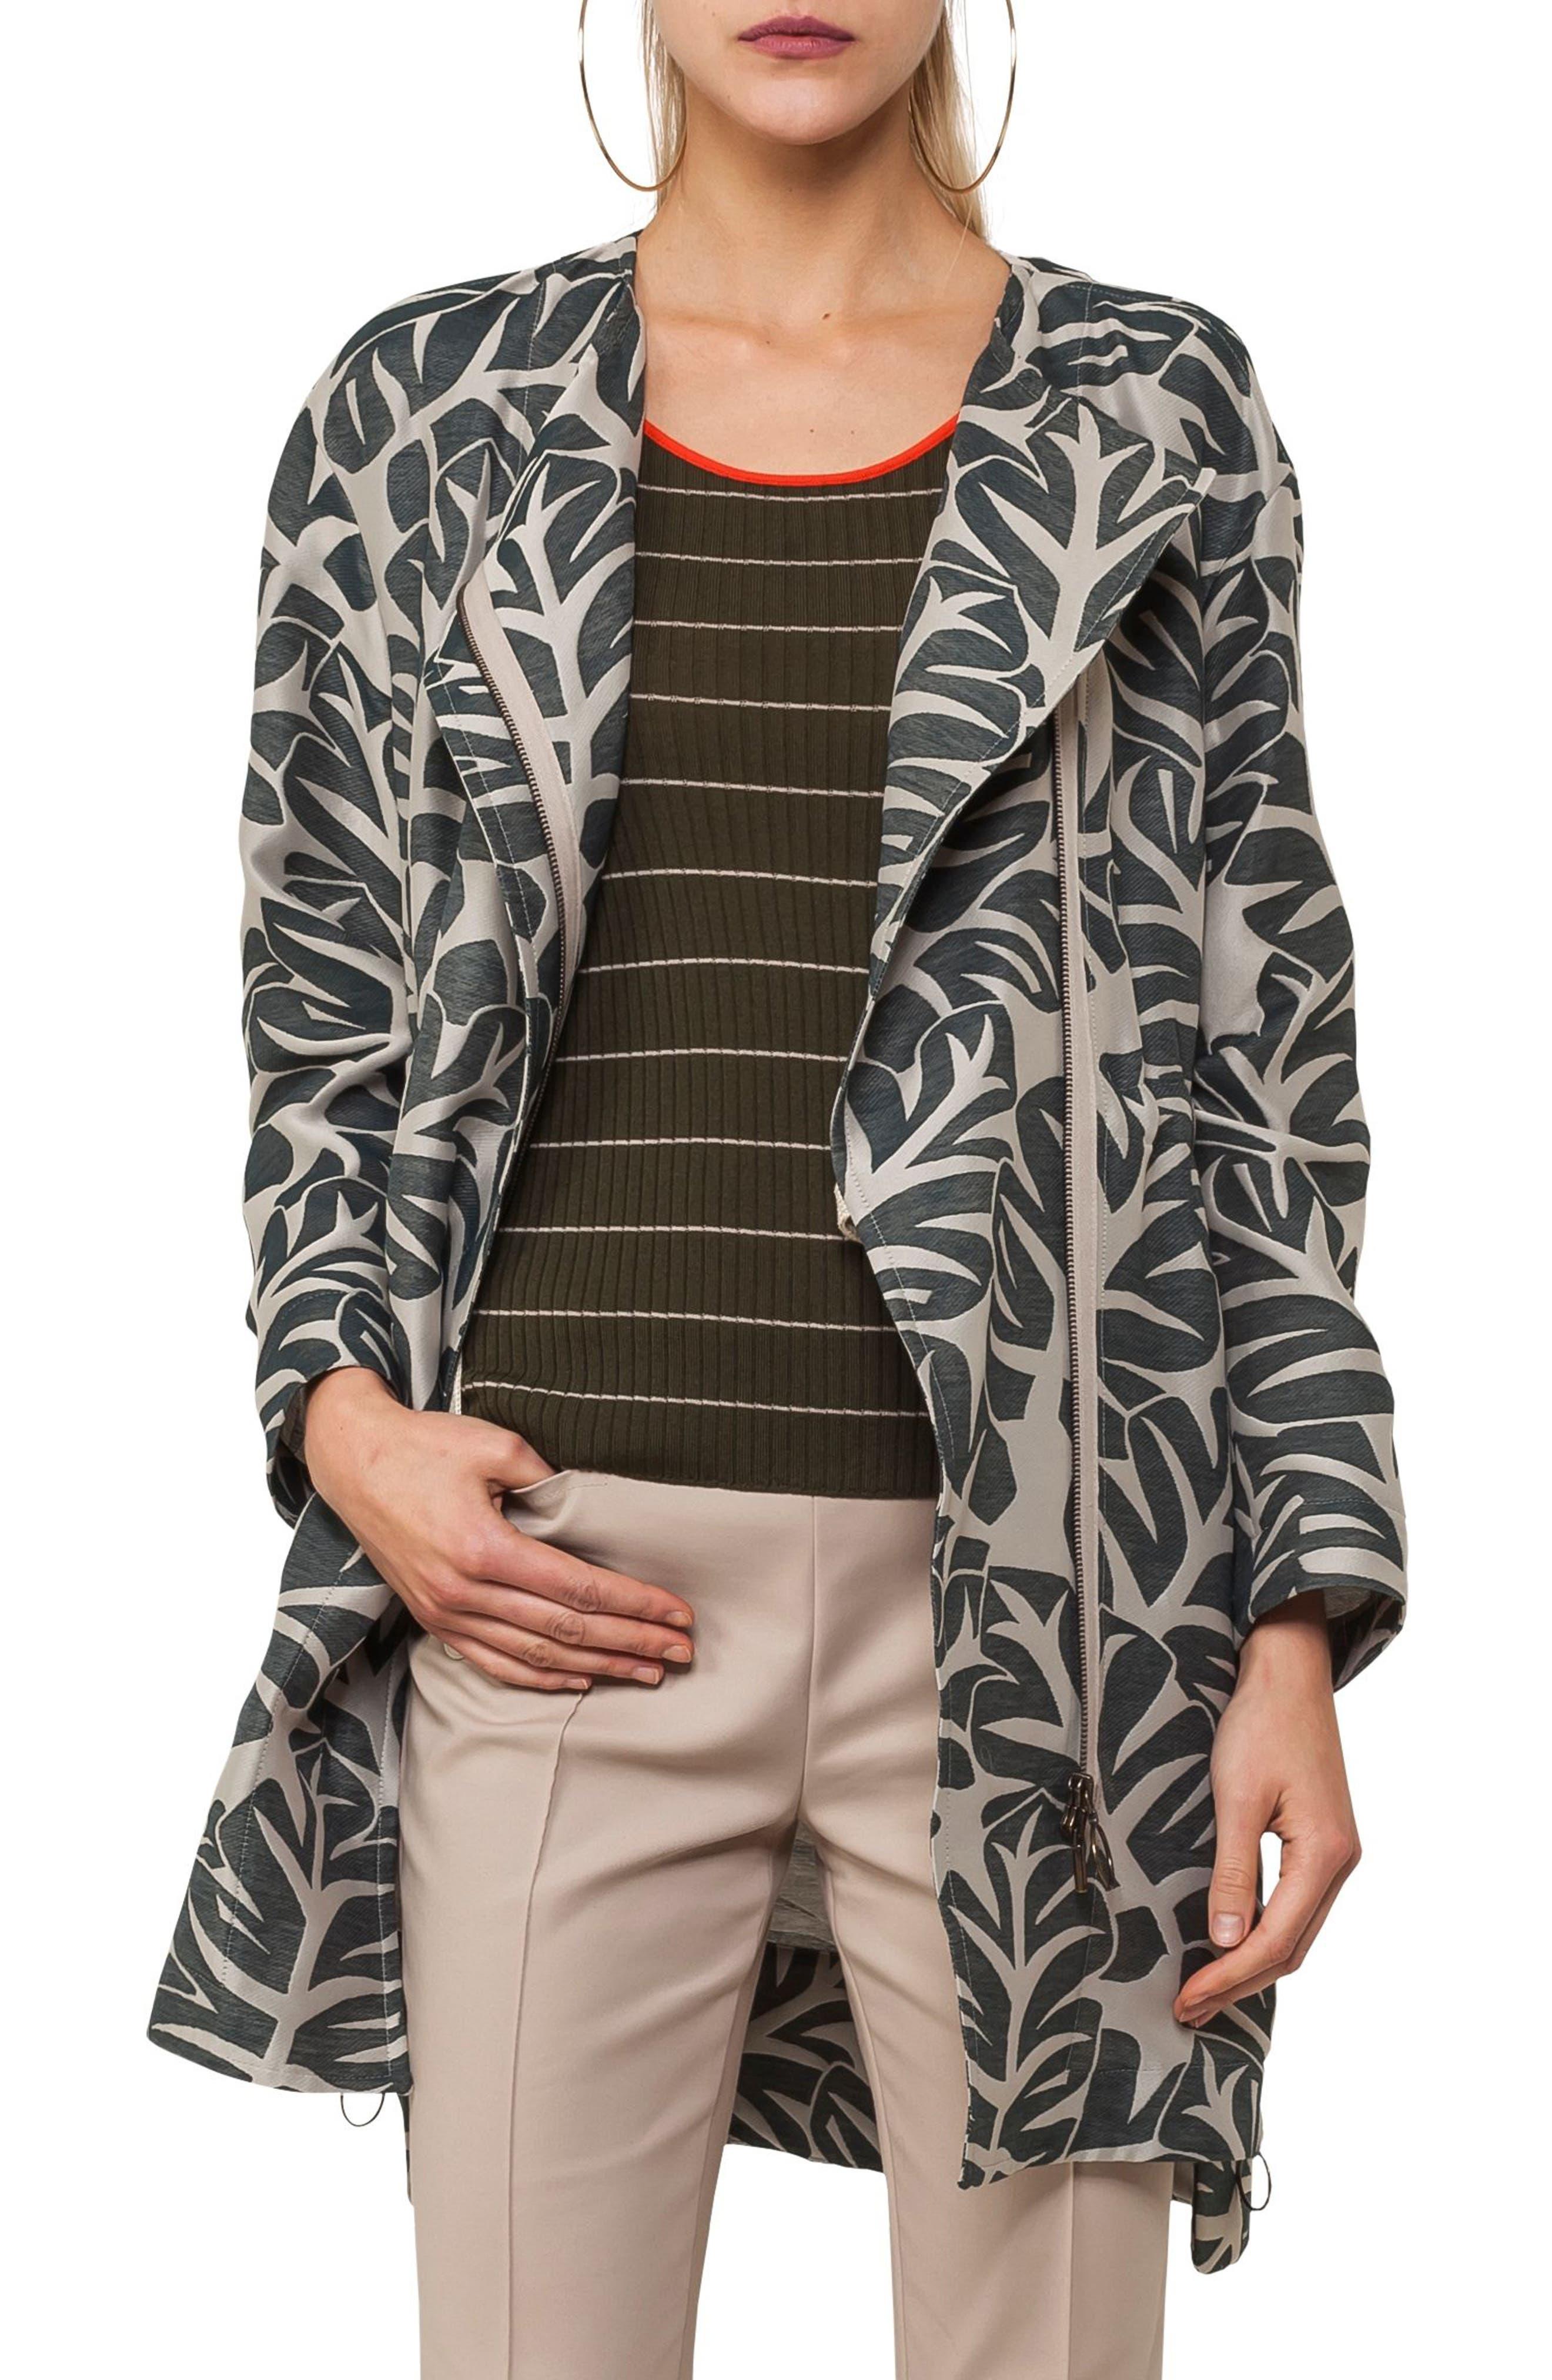 Tricolor Stripe Knit Tee,                             Alternate thumbnail 3, color,                             Avocado / Sand / Papaya